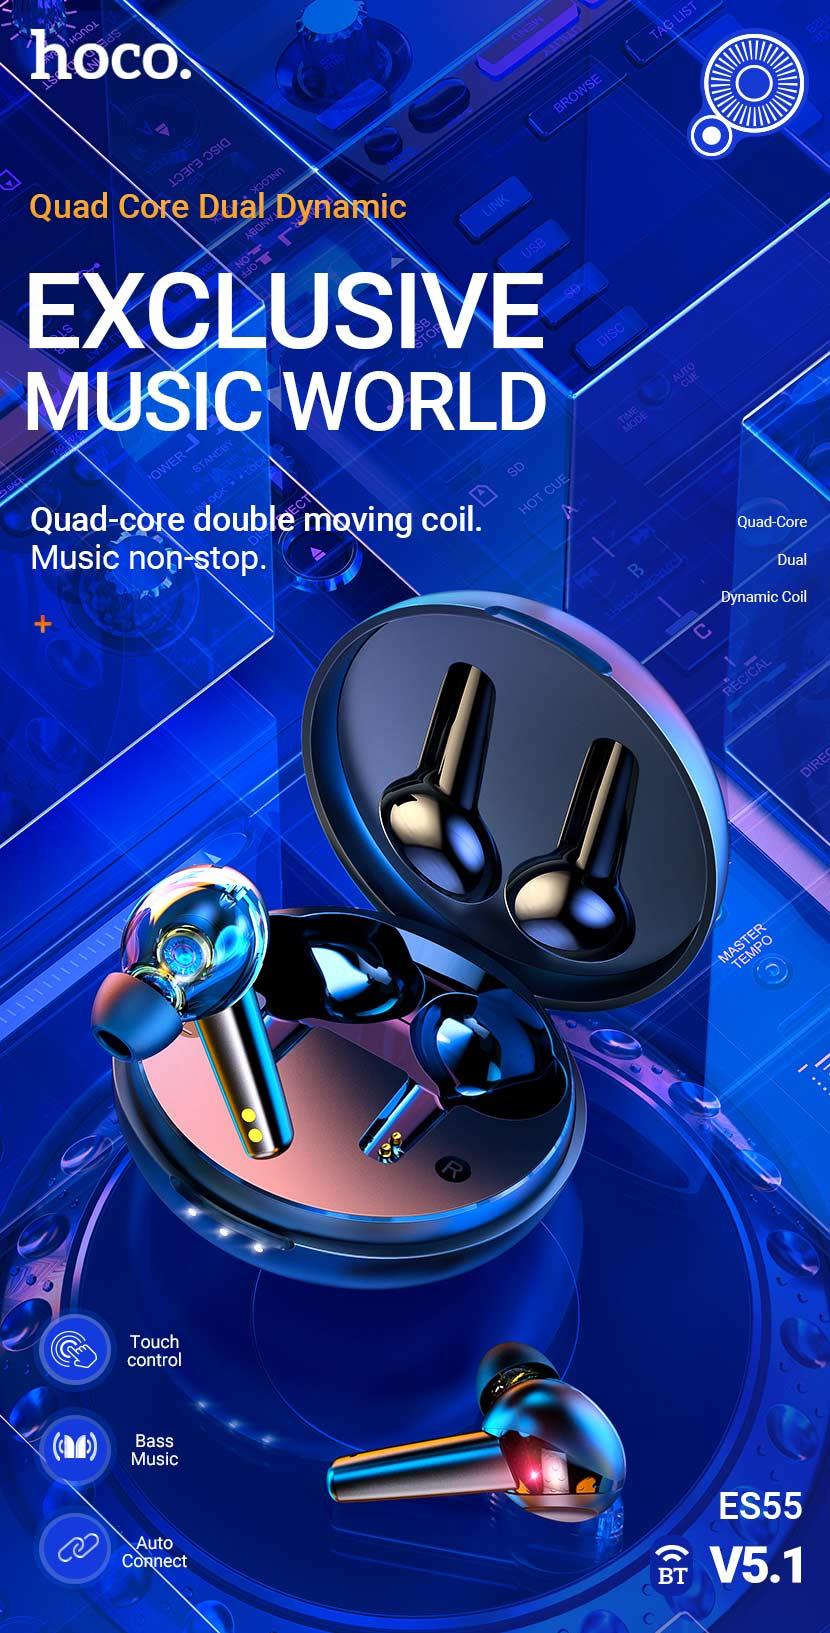 hoco news es55 songful tws dual moving coil wireless bt headset en